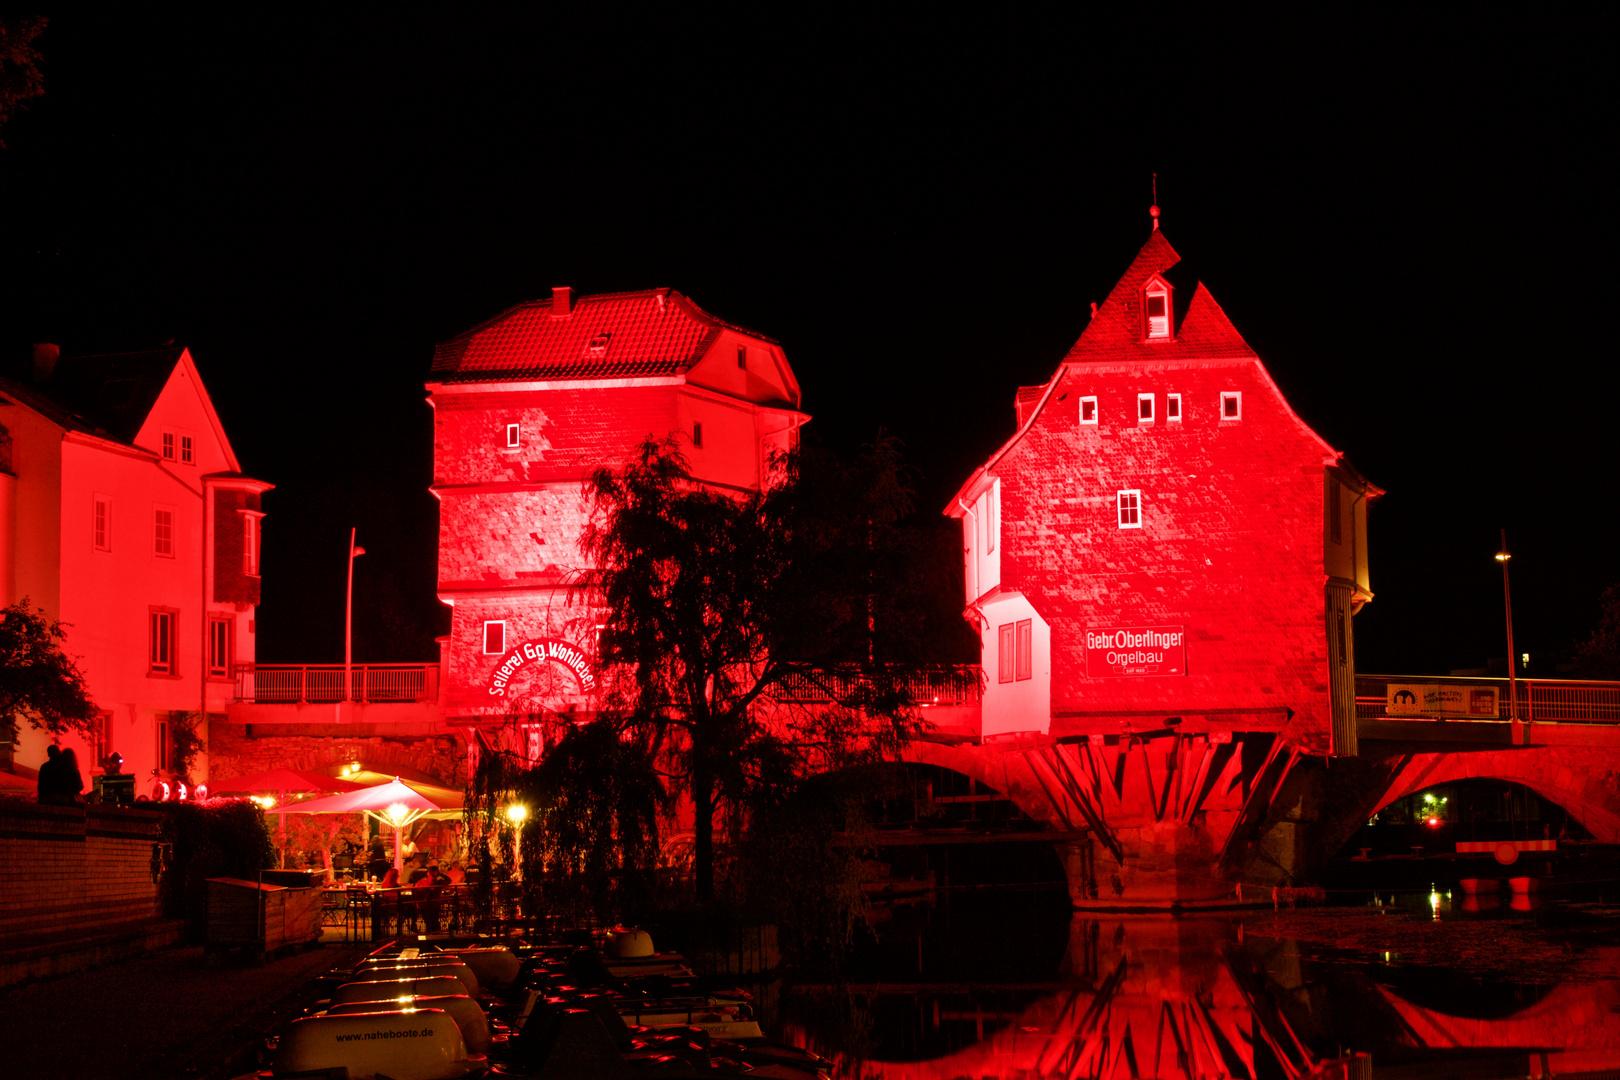 Night of Lights Bad Kreuznach